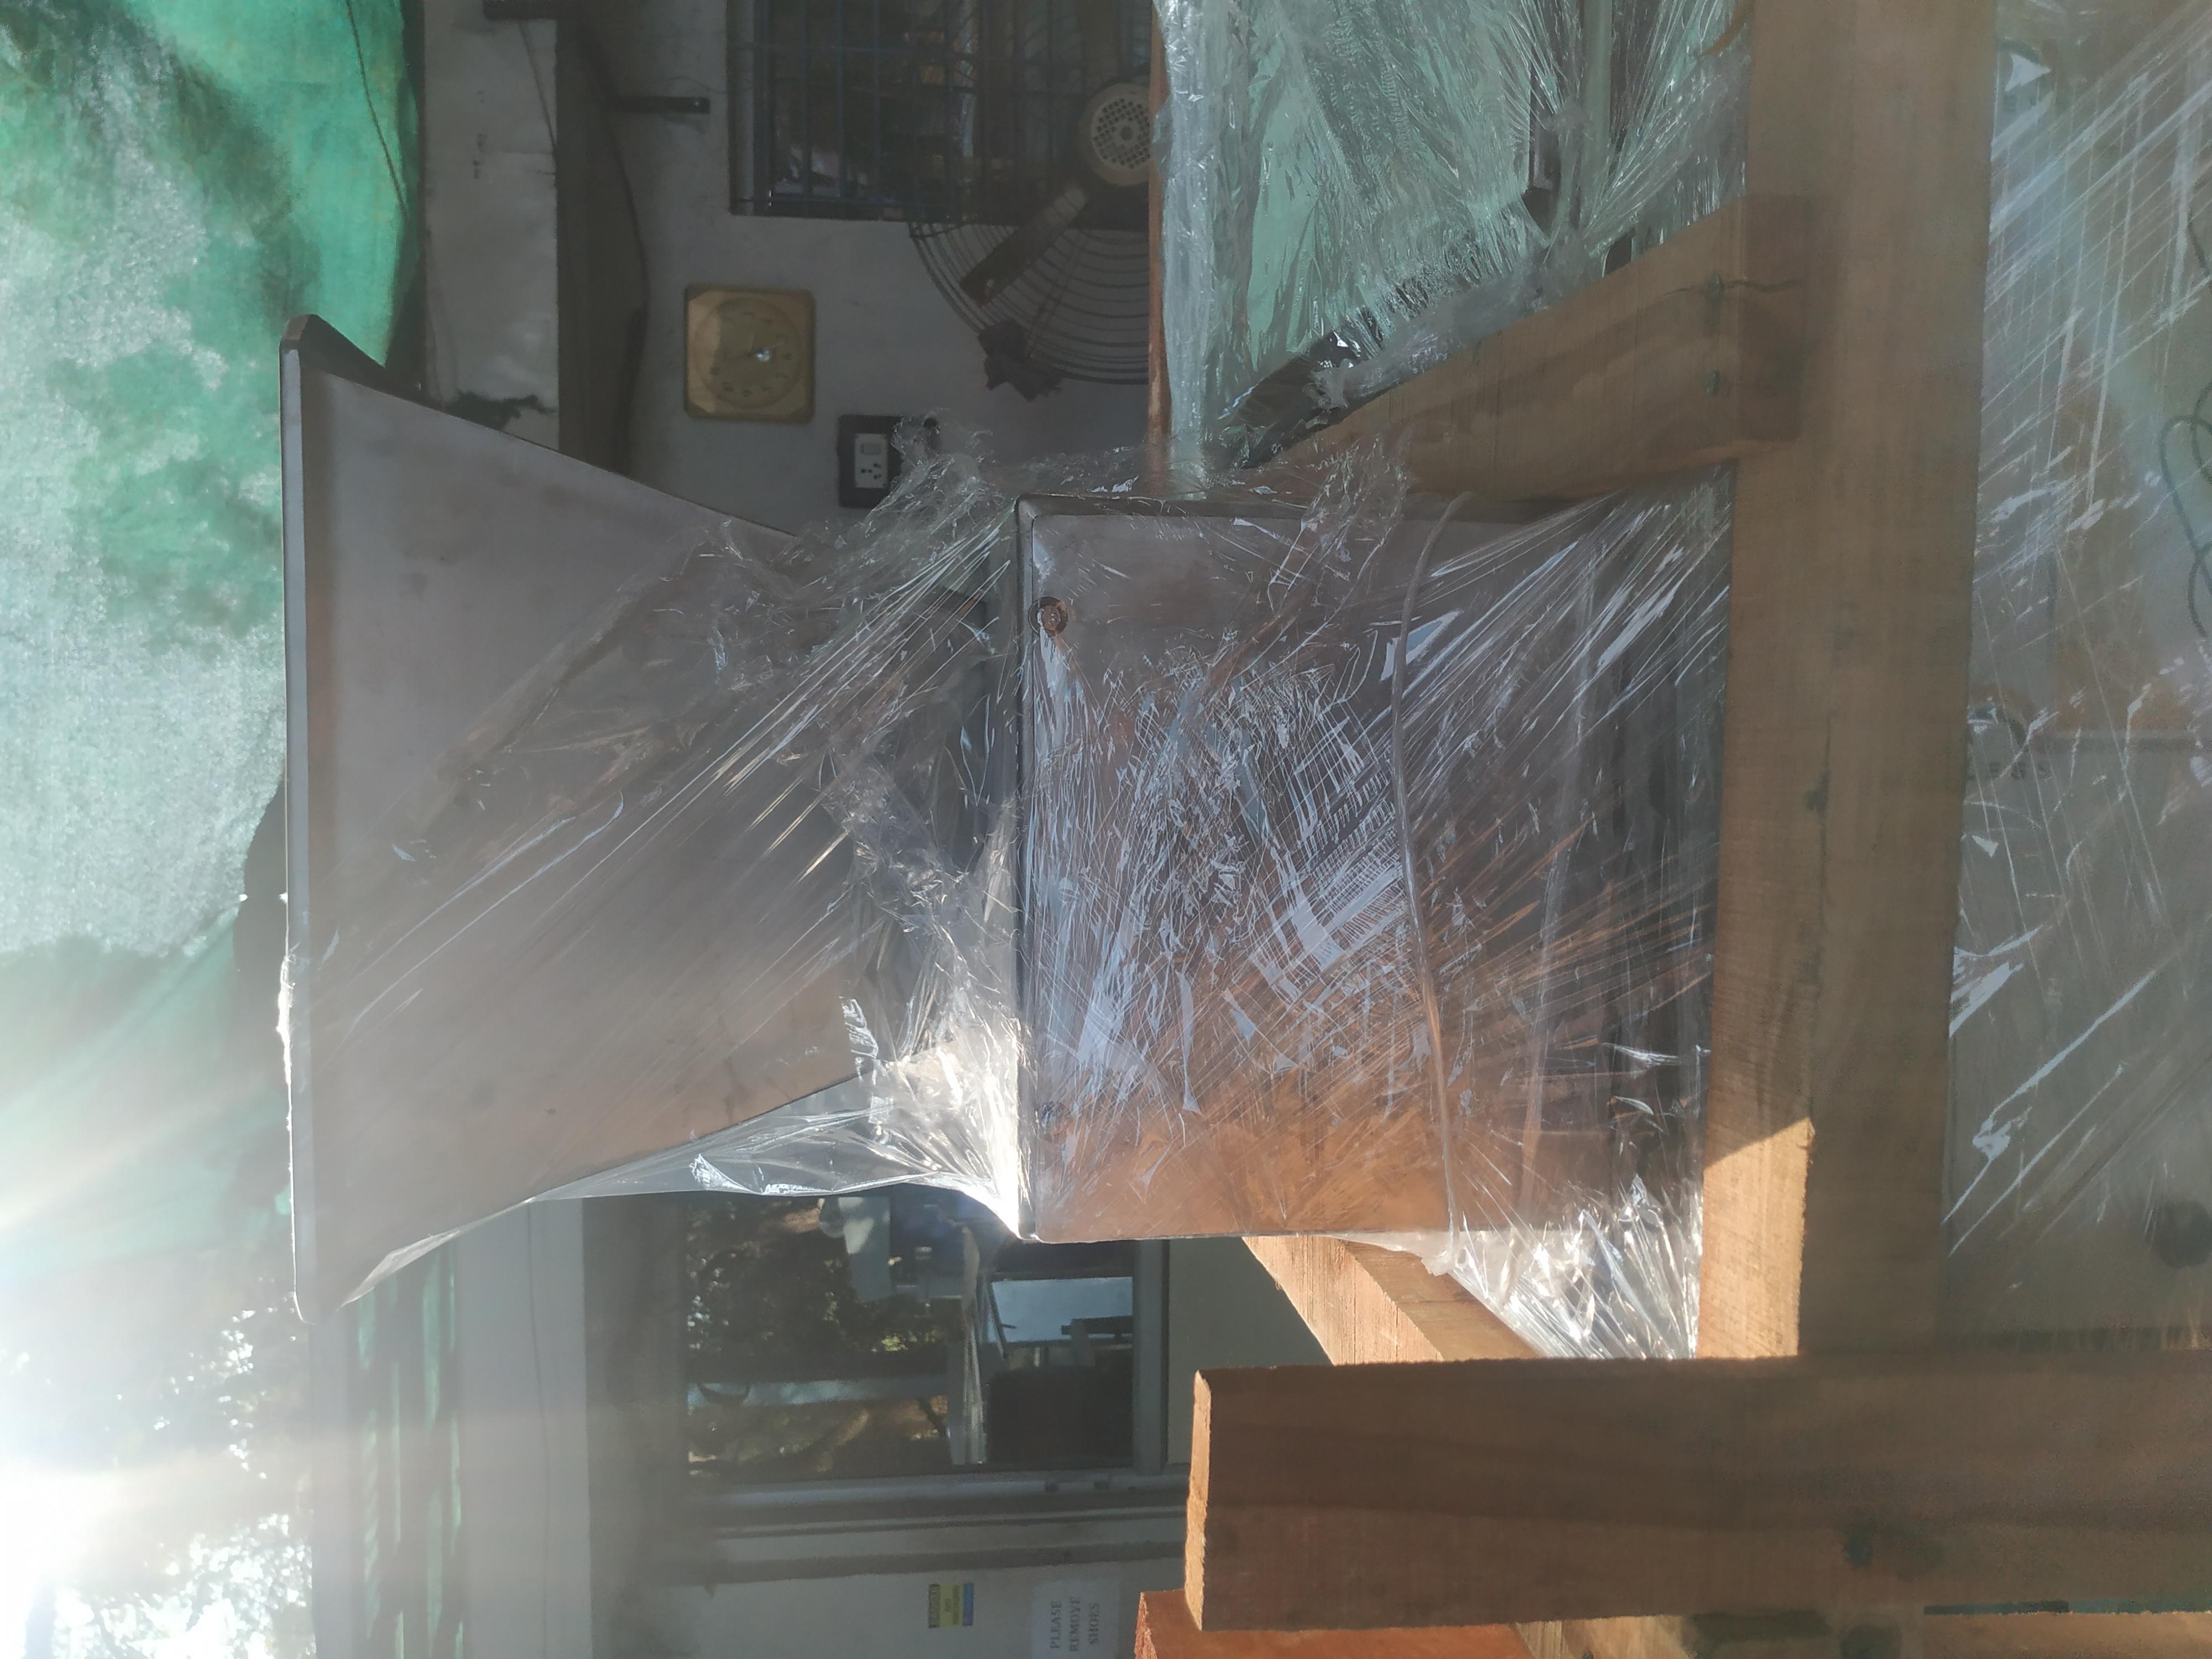 Powder Dryer